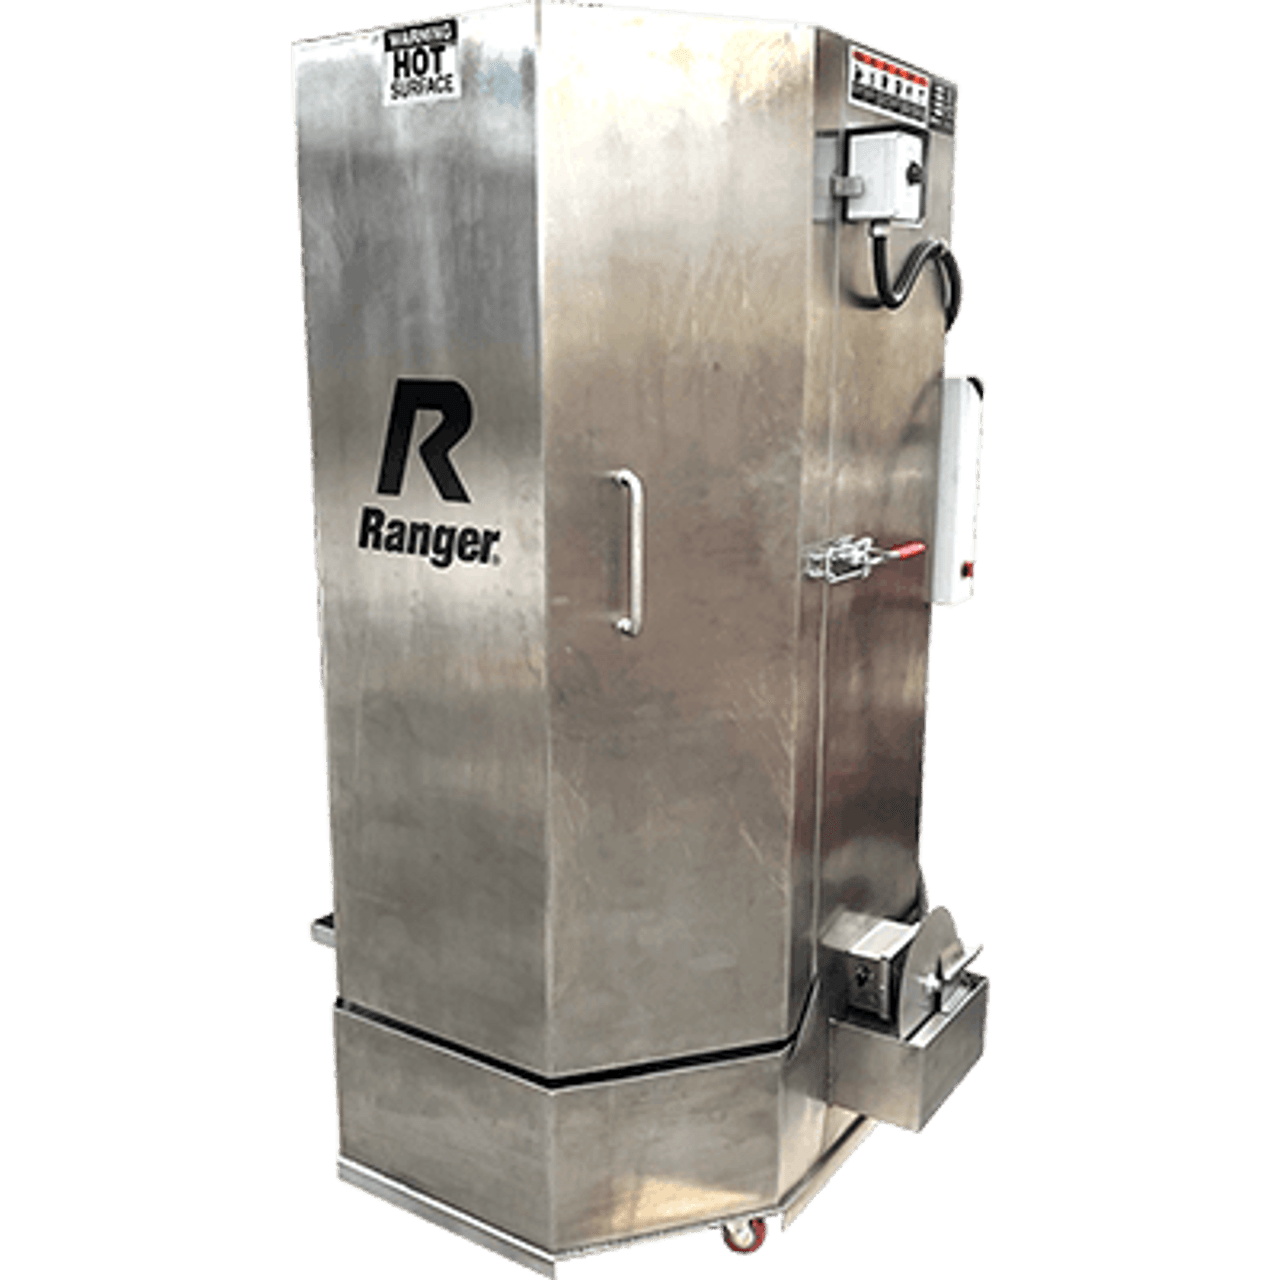 Stainless-Steel Spray Wash Cabinet / Heavy-Duty Truck Dual-Heaters / Low-Water Shutoff